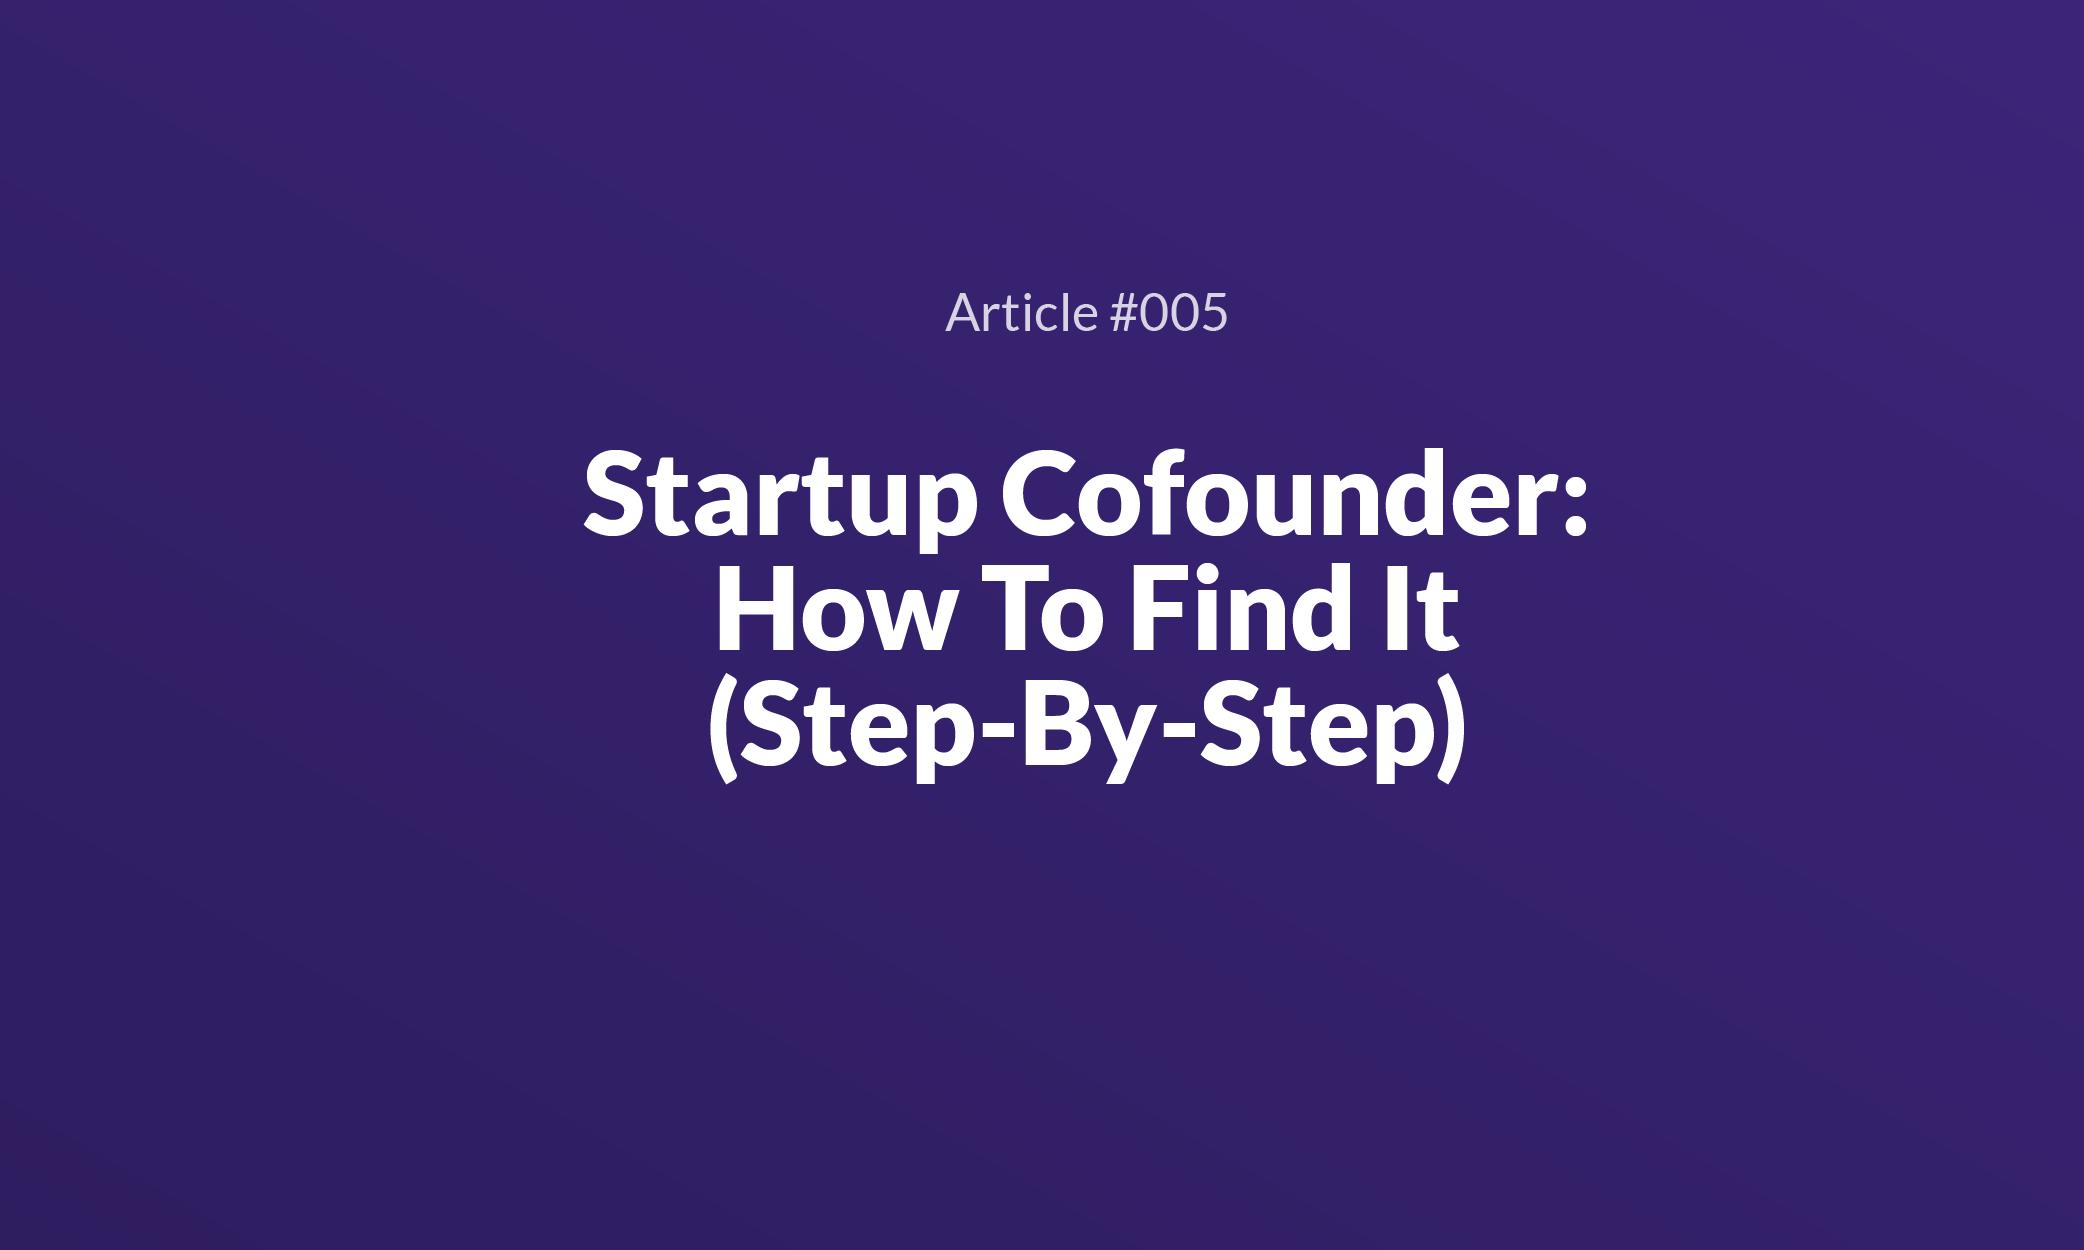 Startup Cofounder